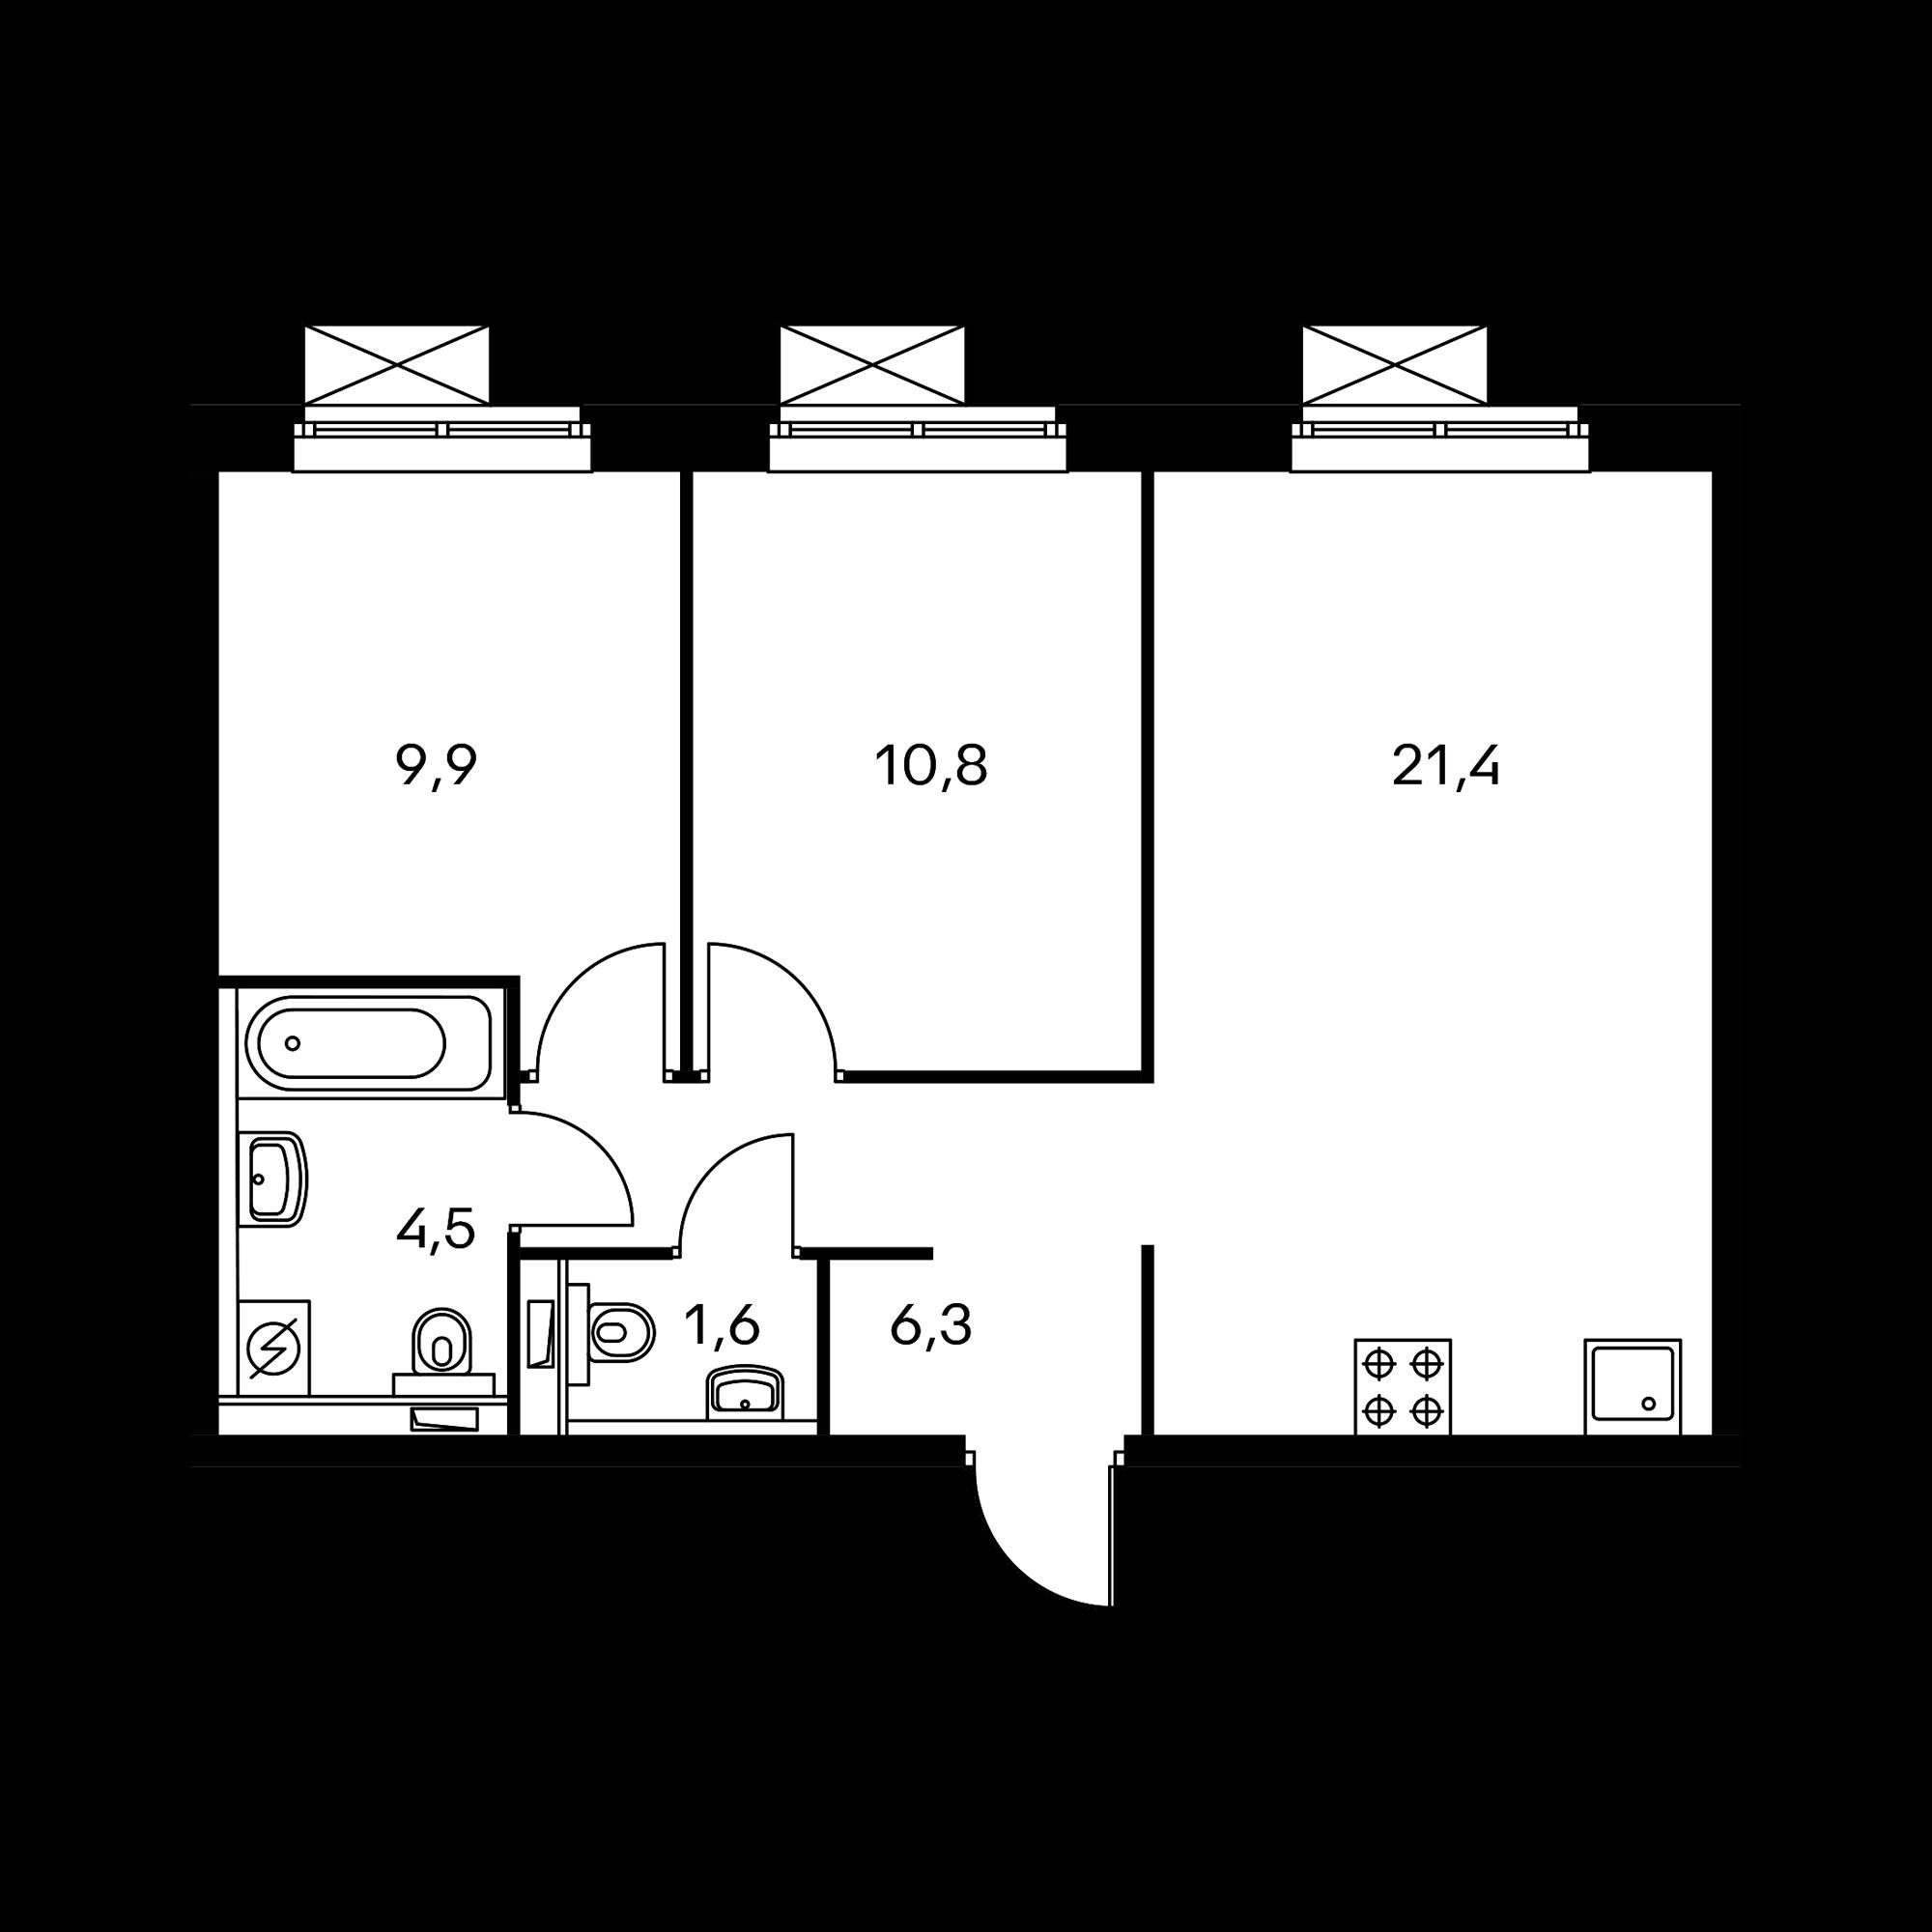 2ES9_9.6-1_S_Z